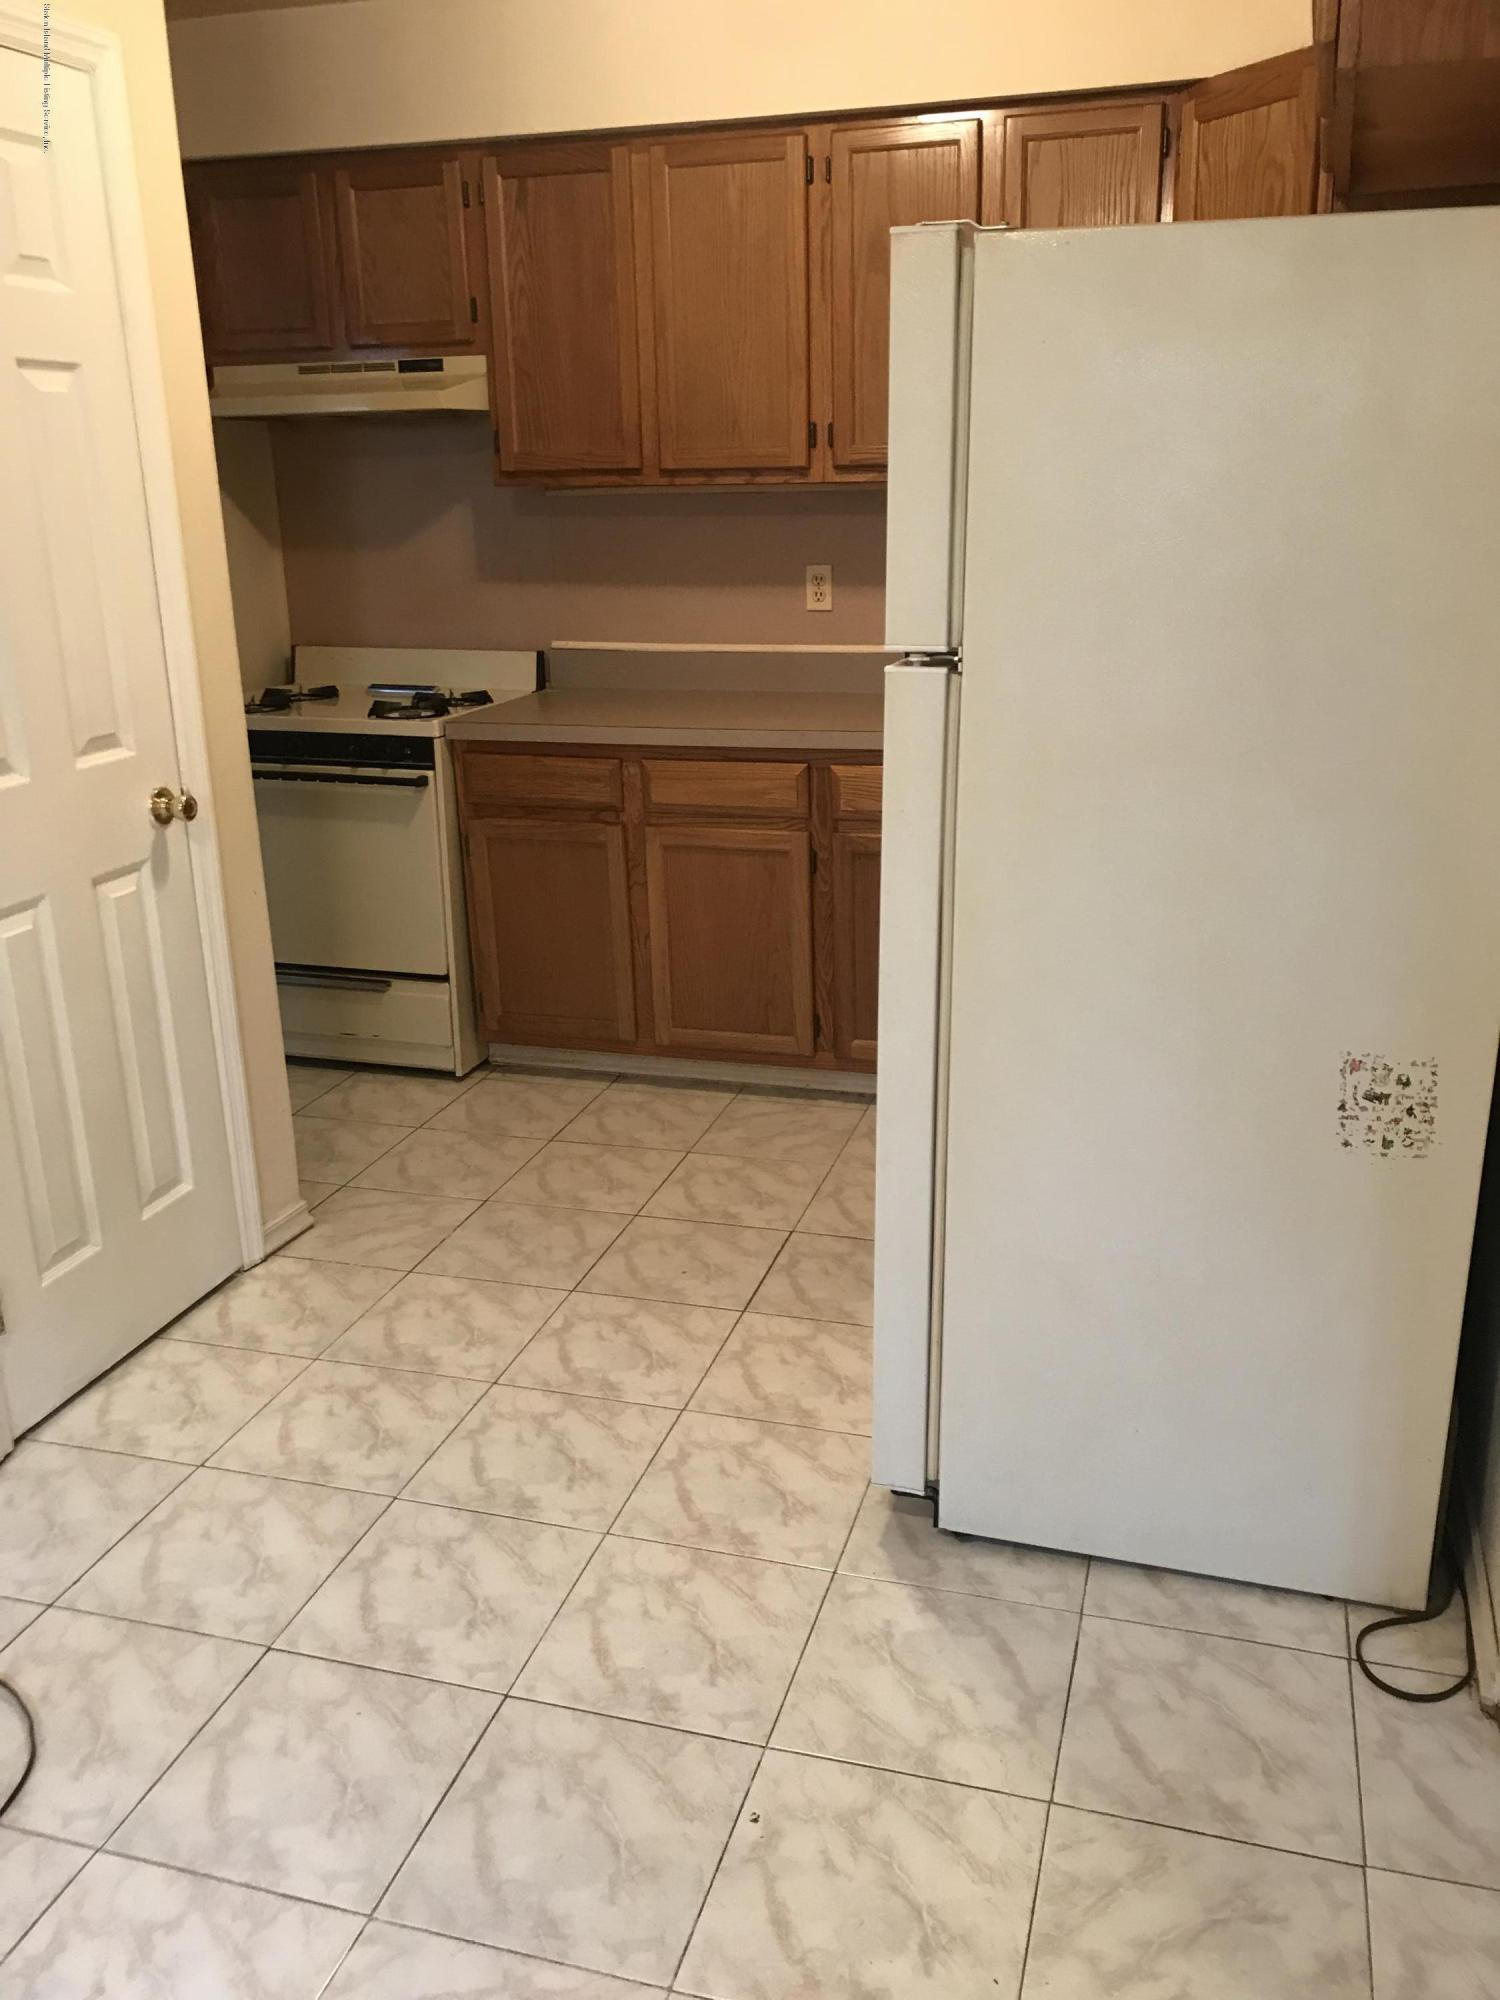 Two Family - Semi-Attached 51 Whitman Avenue  Staten Island, NY 10308, MLS-1124445-23